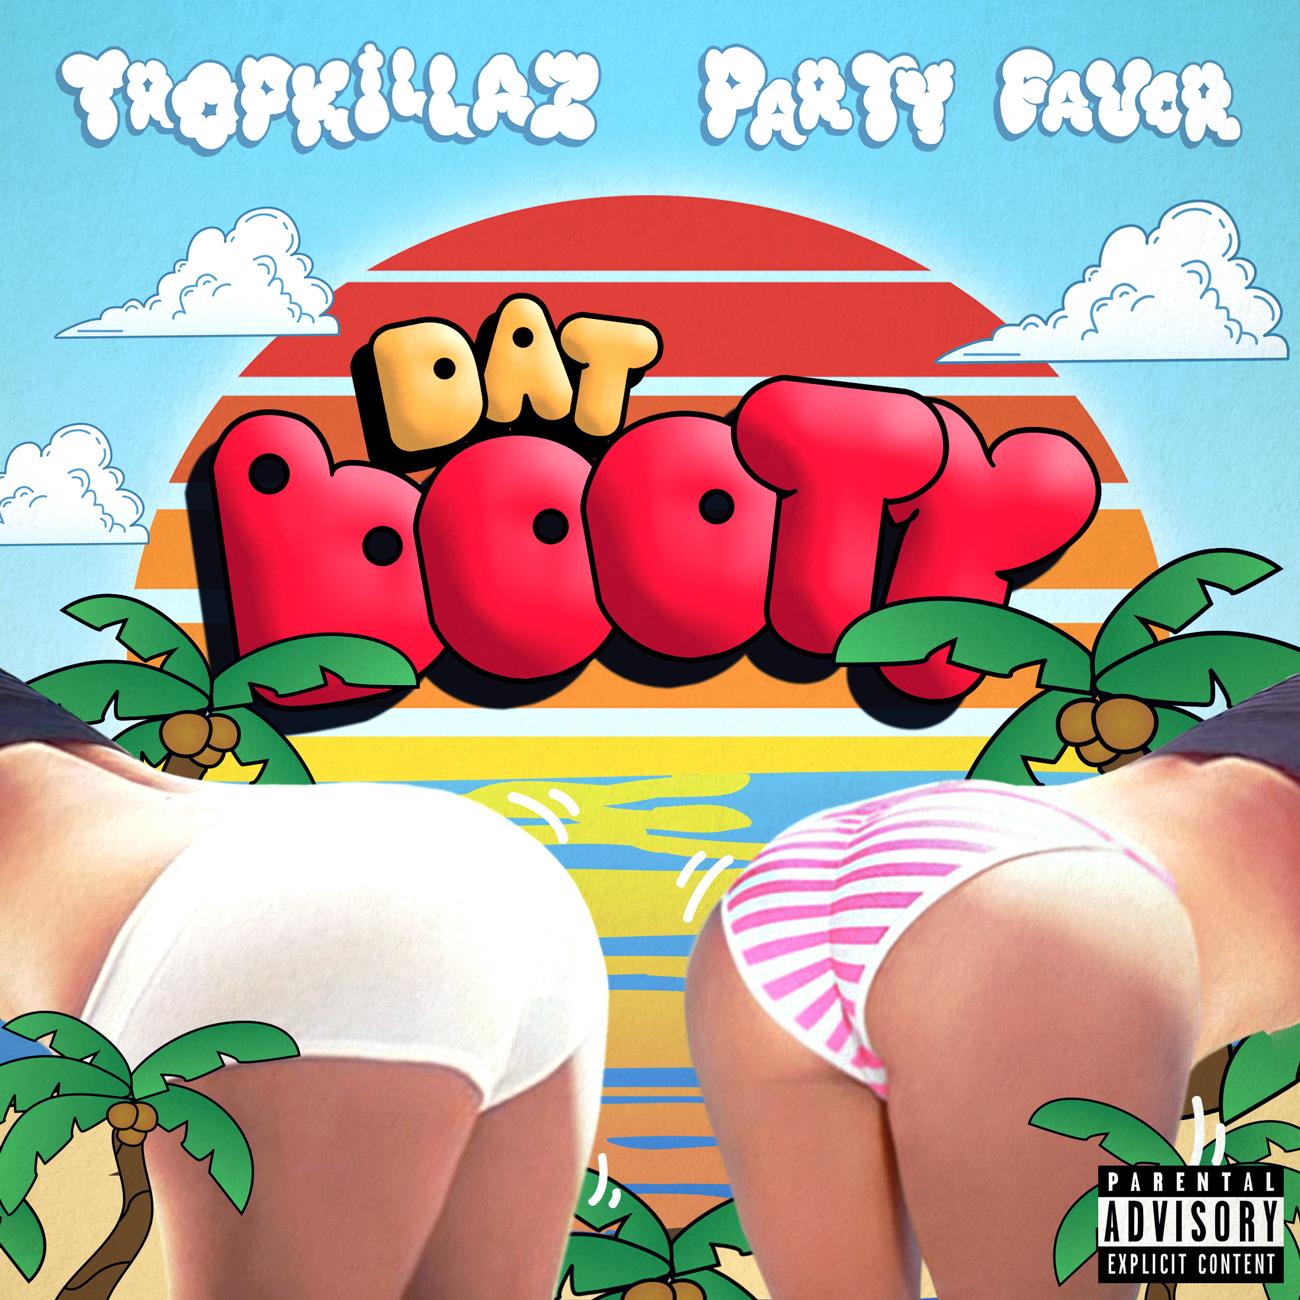 Tropkillaz & Party Favor - Dat Booty